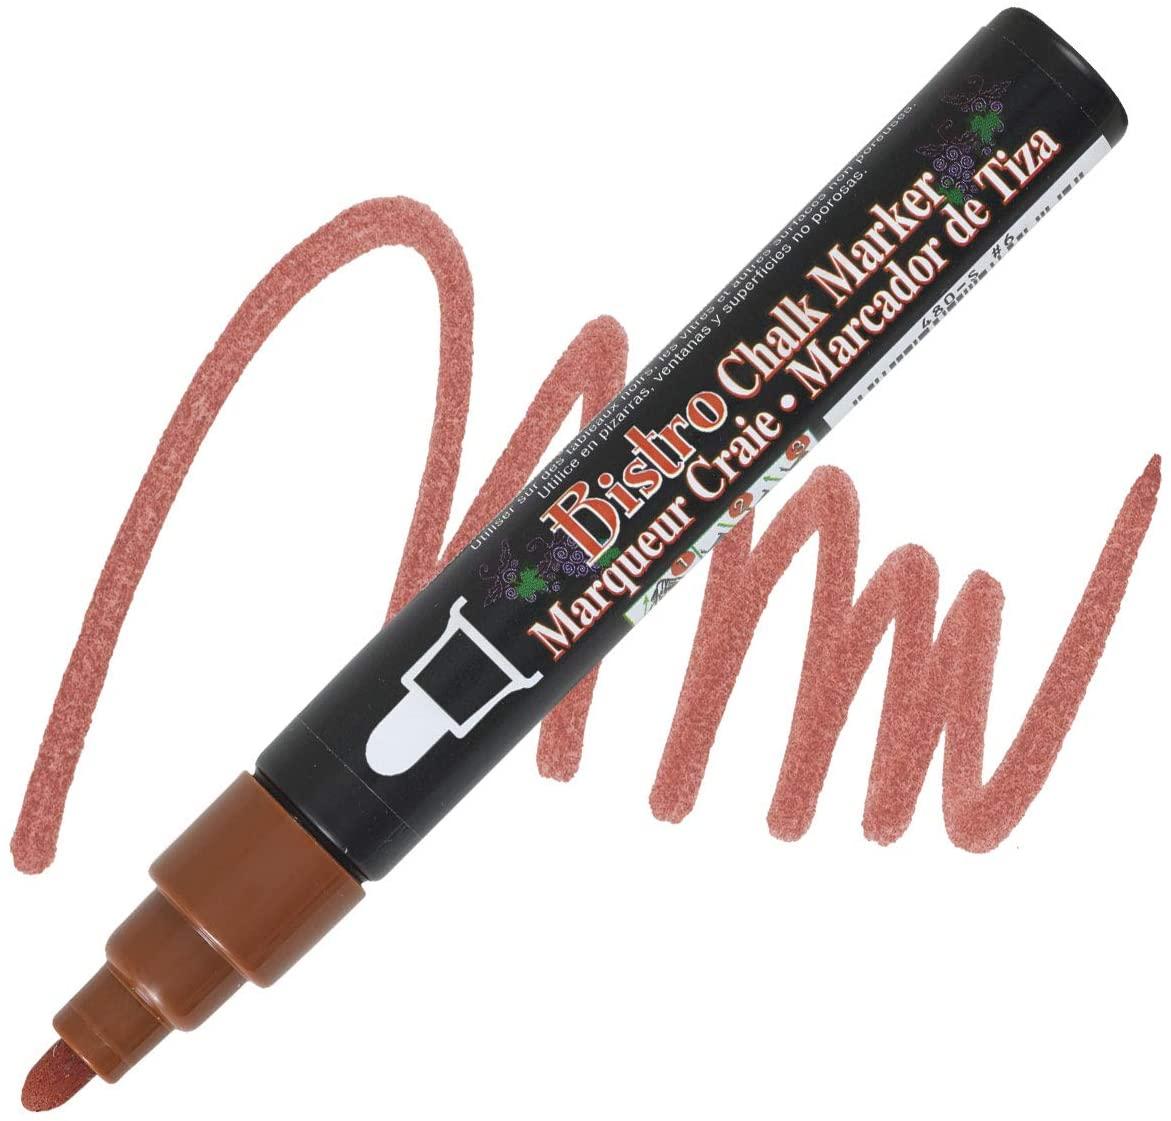 Uchida Bistro Water-based Chalk Markers-Bistro Chalk Marker,6mm Tip,Erasable,Water-based,Brown